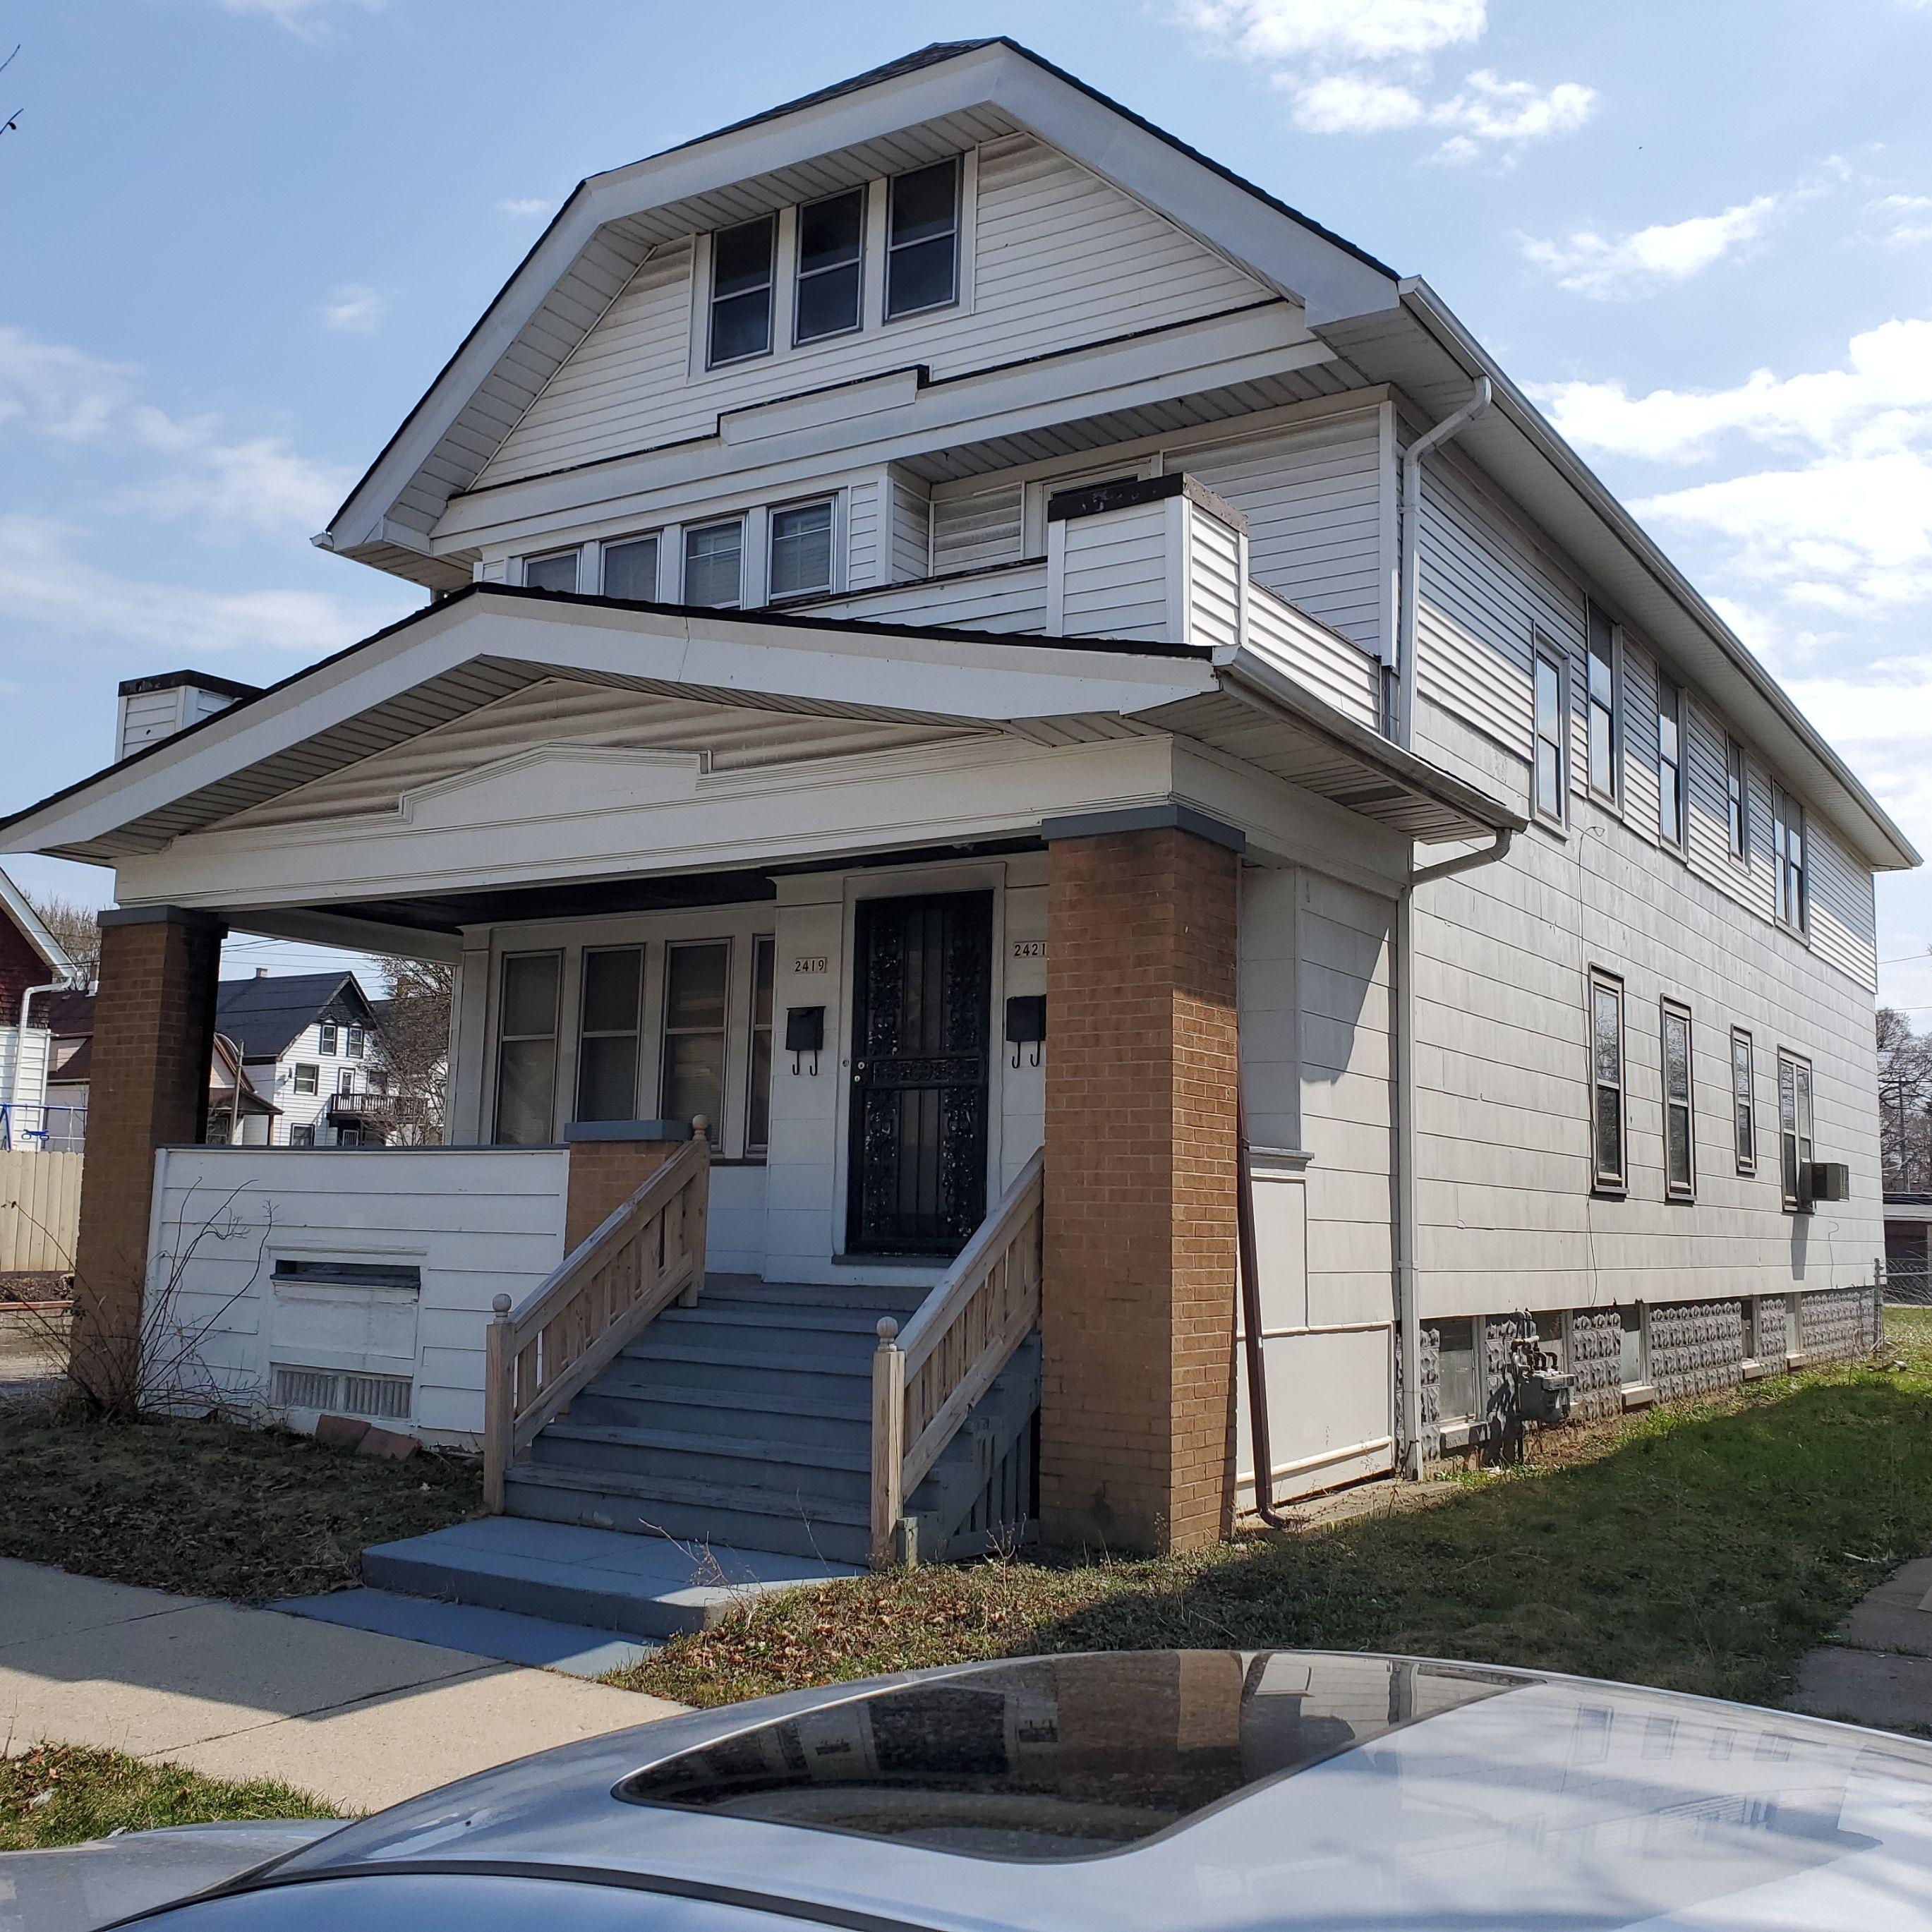 2419 W Keefe Ave, Milwaukee, WI